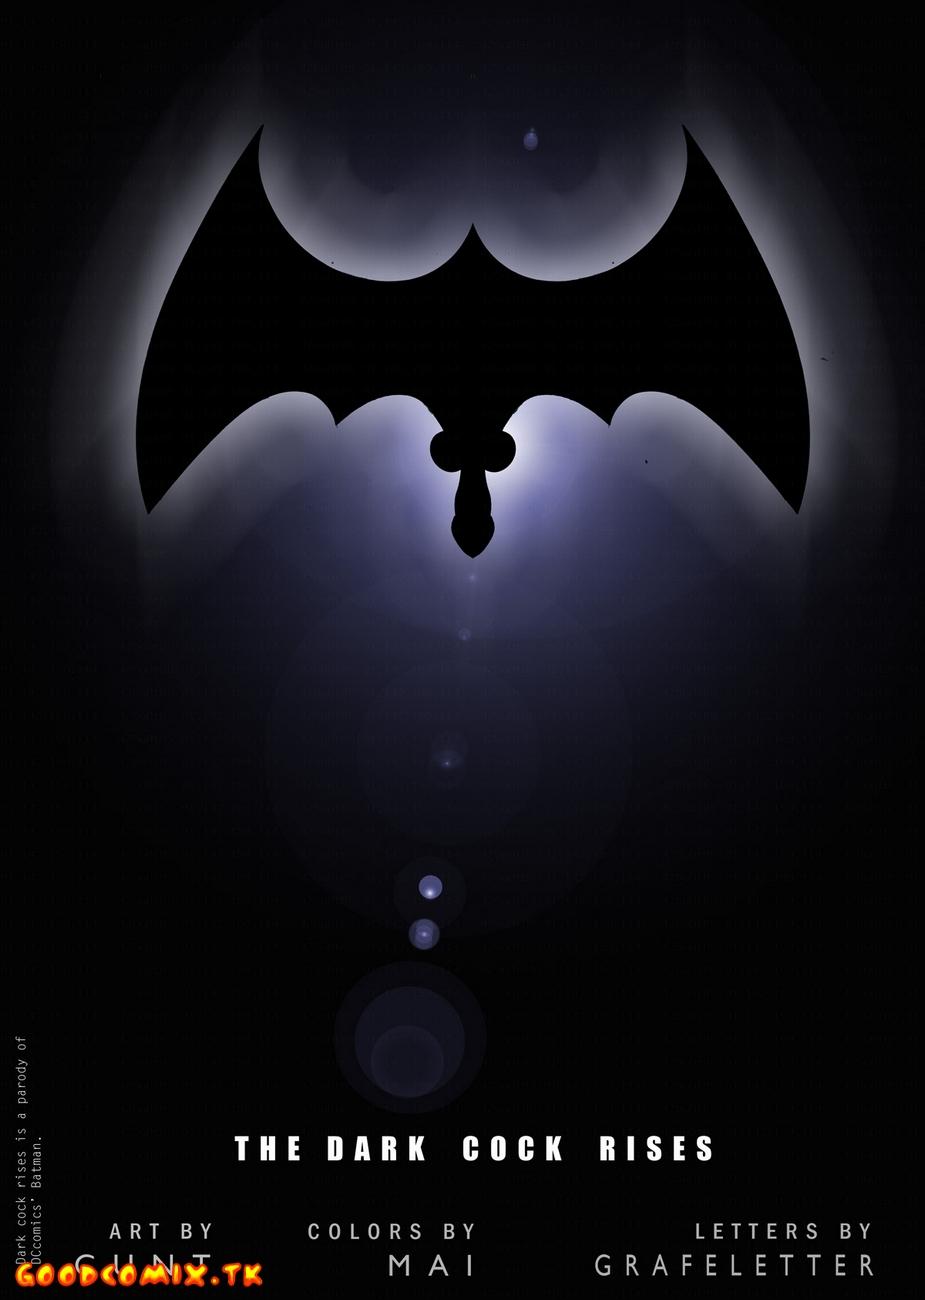 Goodcomix Batman - [JKRcomix][Cunt] - The Dark Cock Rises